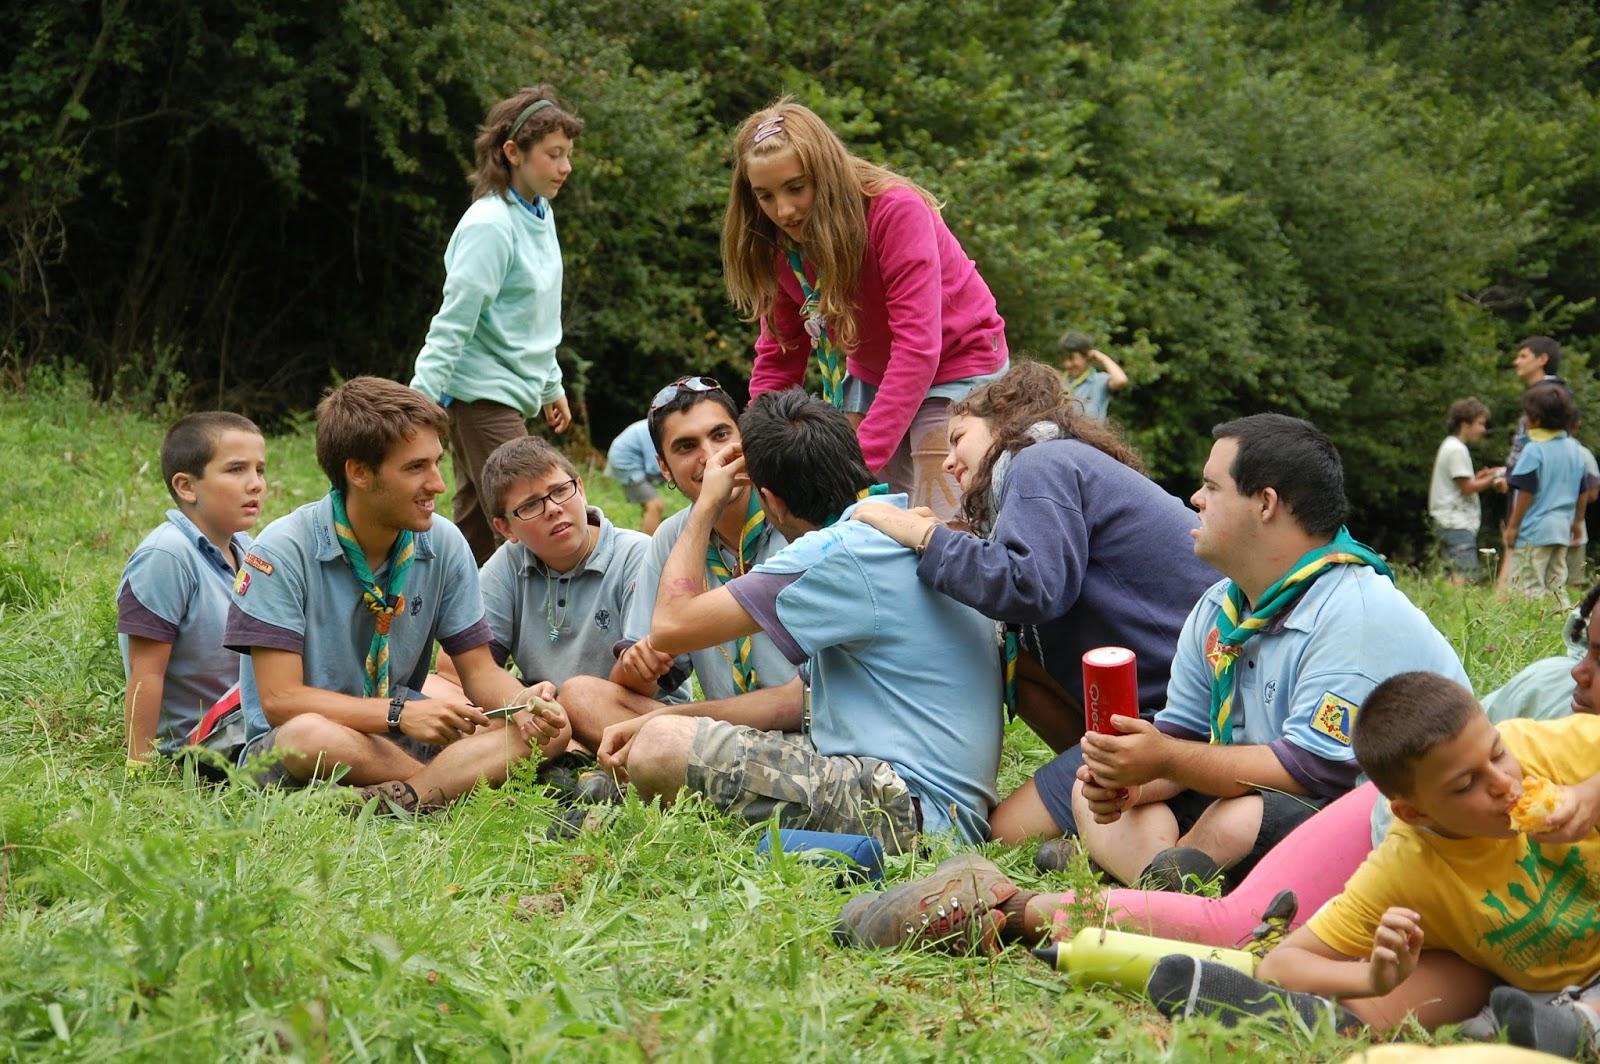 Campaments Estiu RolandKing 2011 - DSC_0069%2B2.JPG